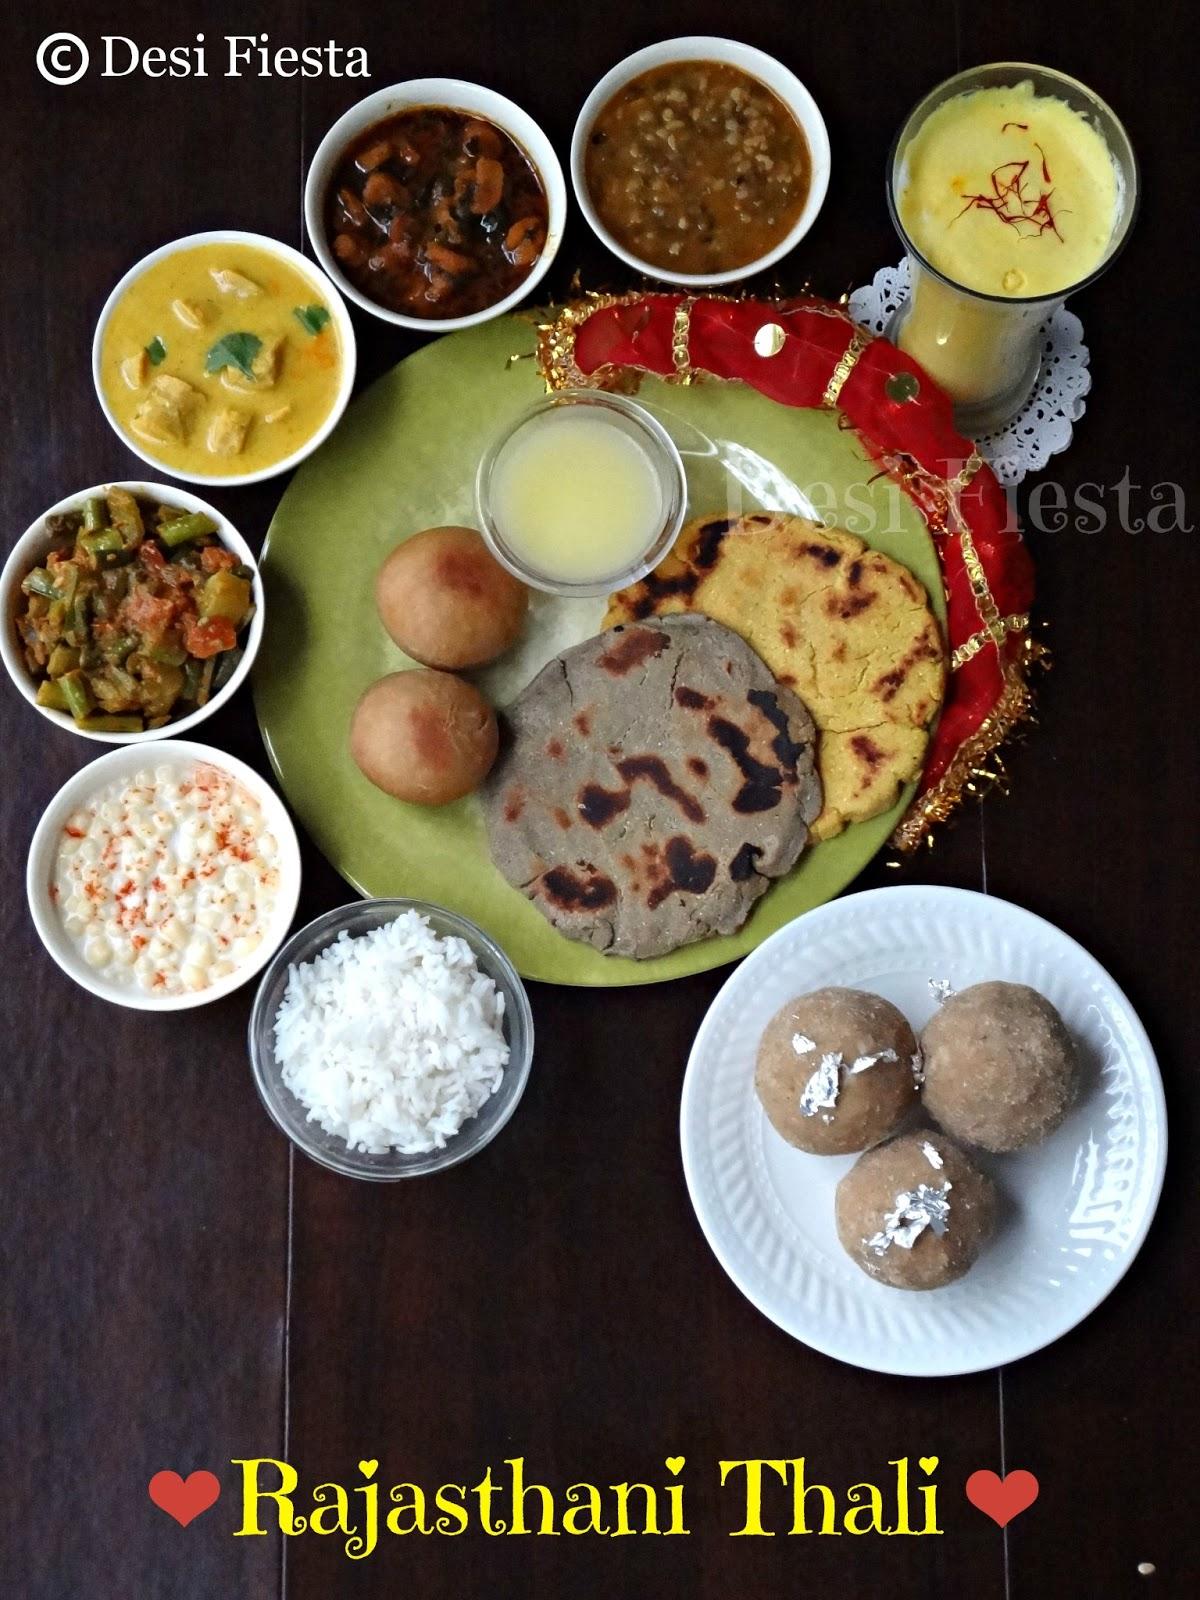 Rajasthani thali snc challange 10 desi fiesta rajasthani food forumfinder Choice Image